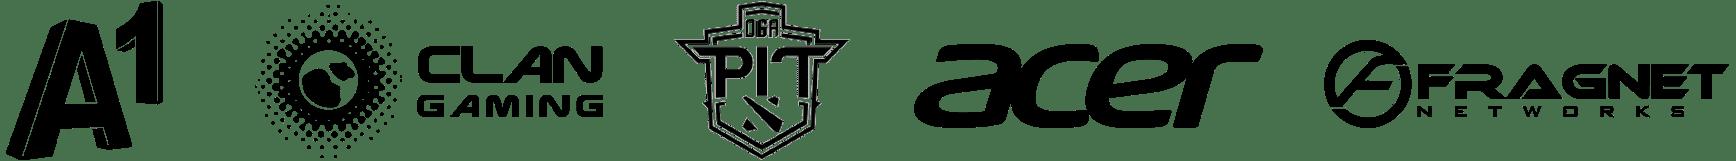 CSadria Clan Championship sponzori